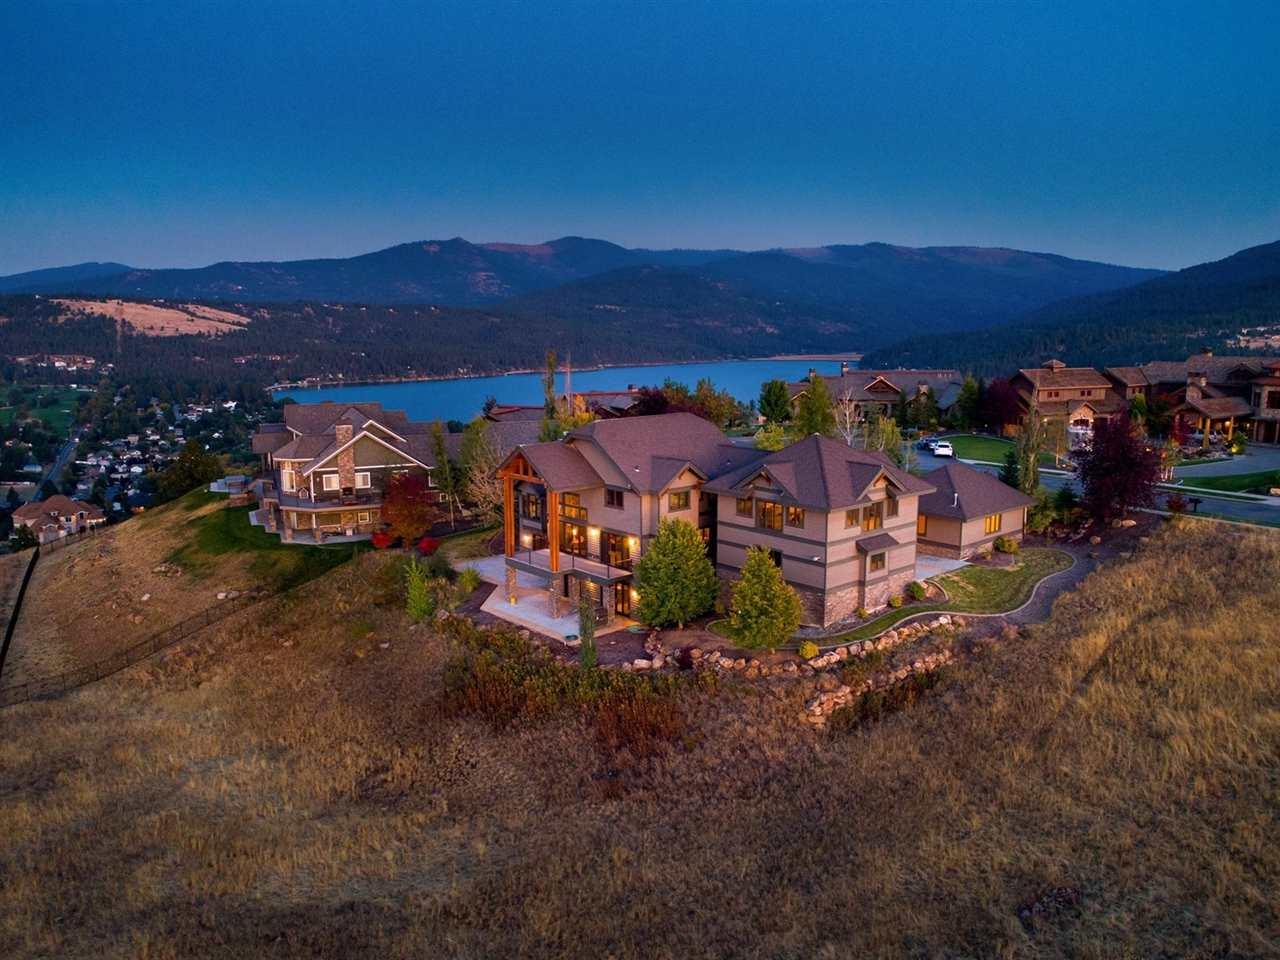 Single Family Home for Sale at 22251 E Bennett Lane 22251 E Bennett Lane Liberty Lake, Washington 99019 United States